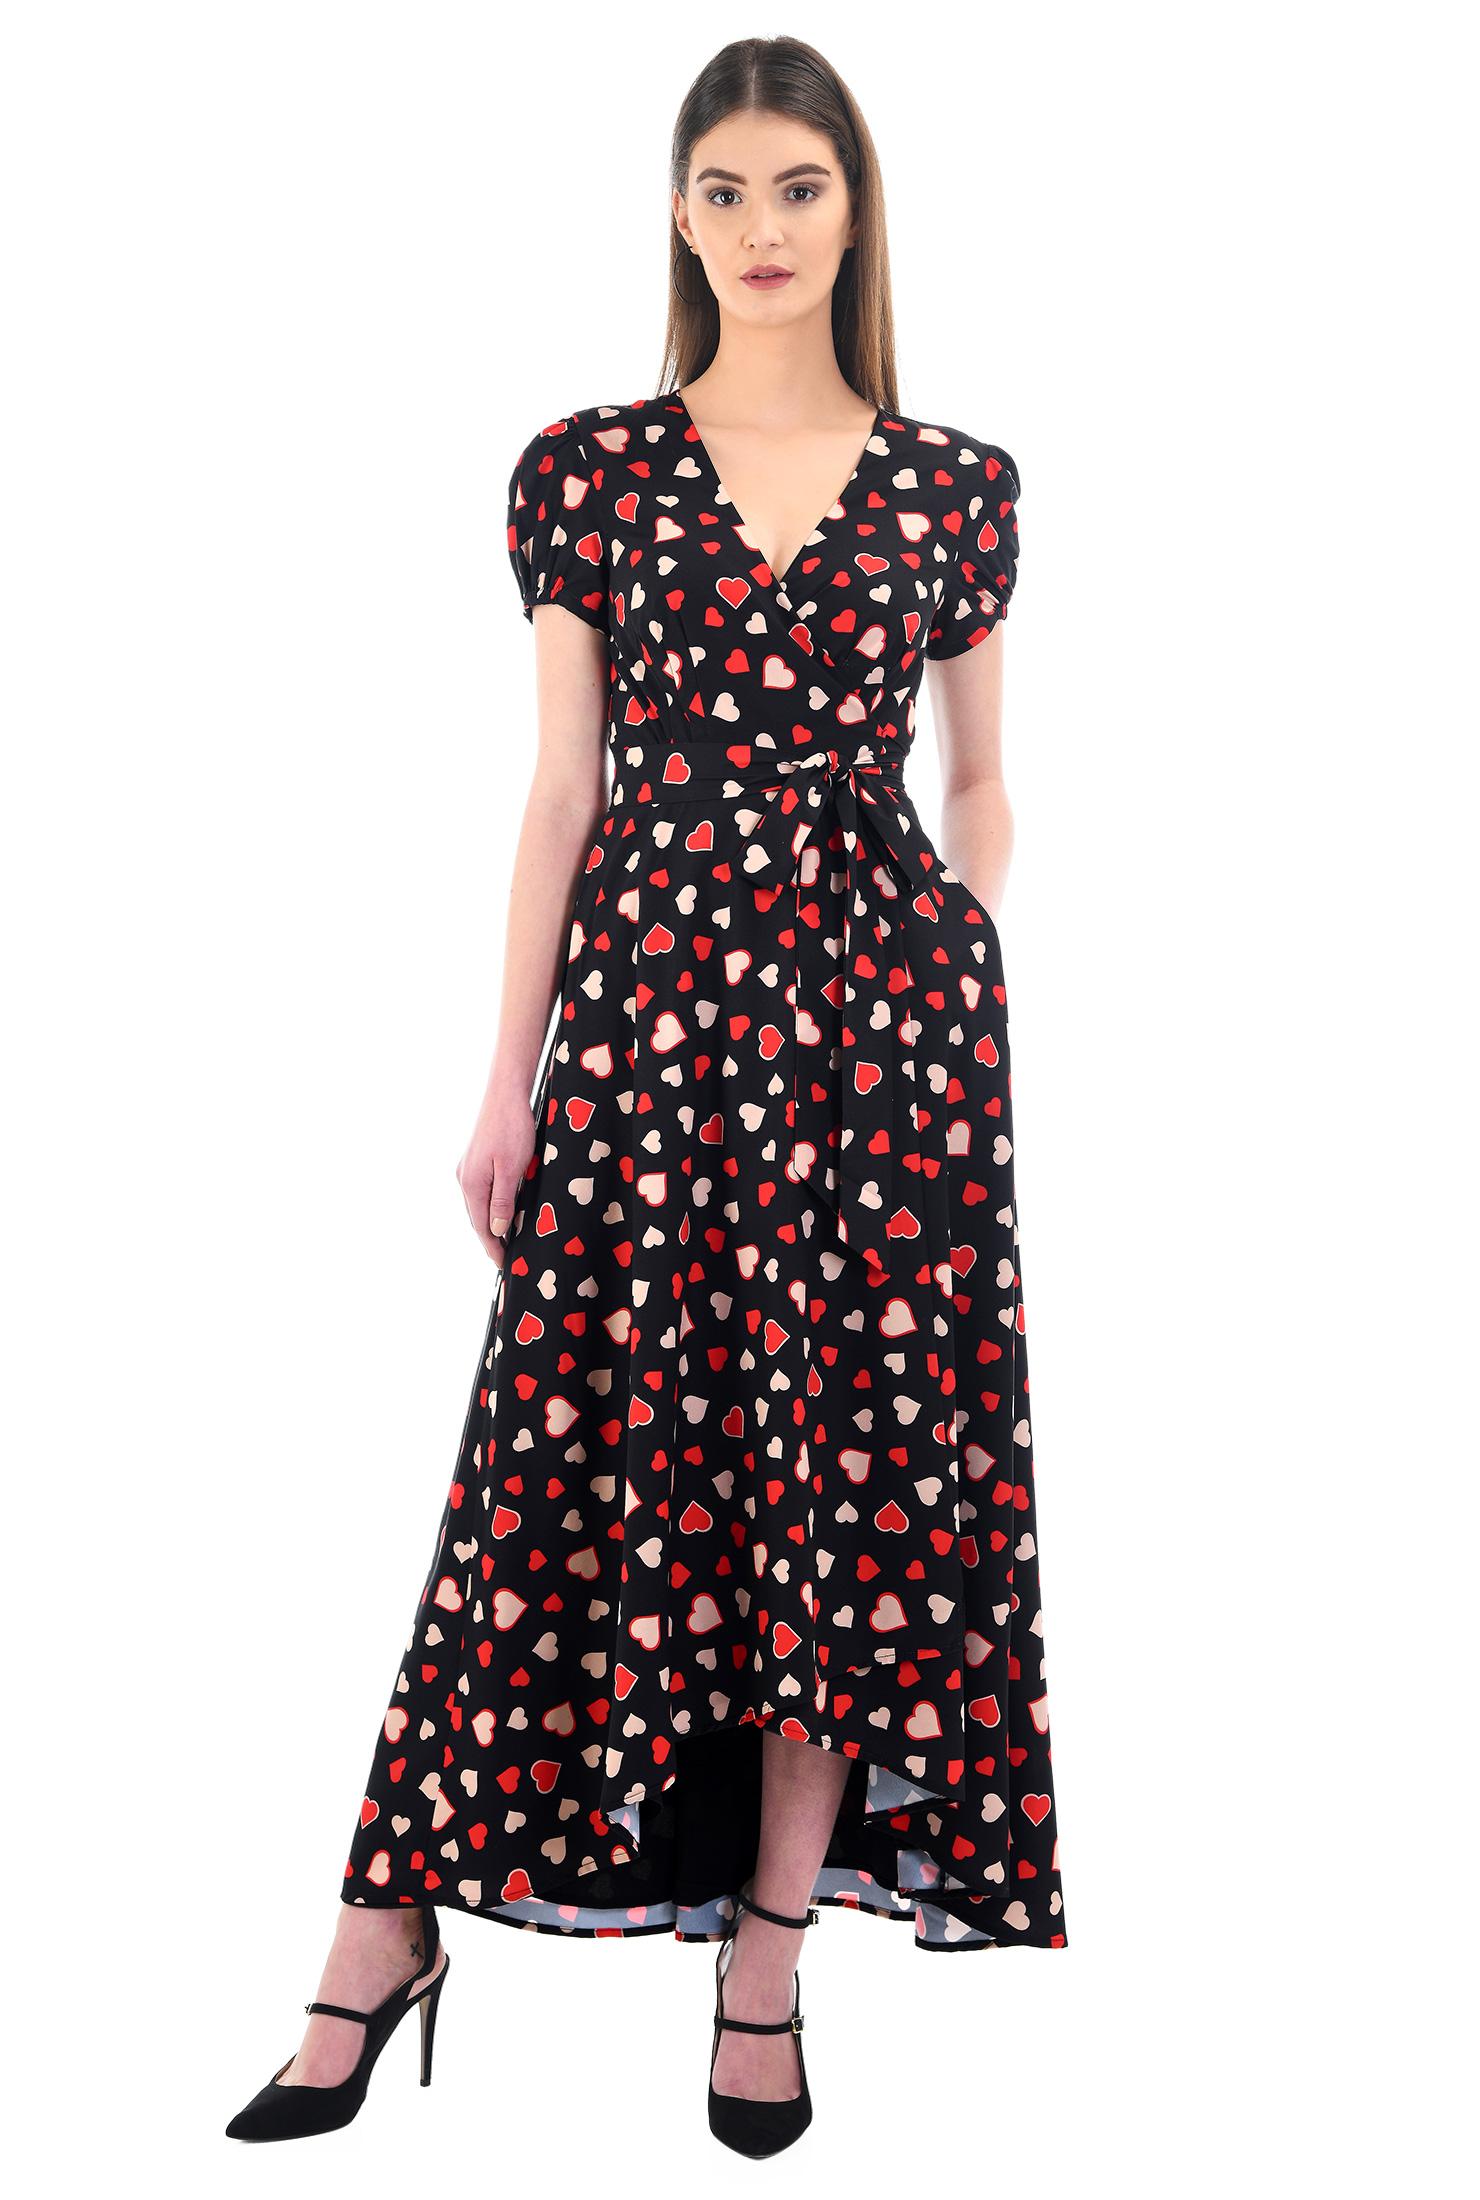 4b8f9cfc6cab Women s Fashion Clothing 0-36W and Custom